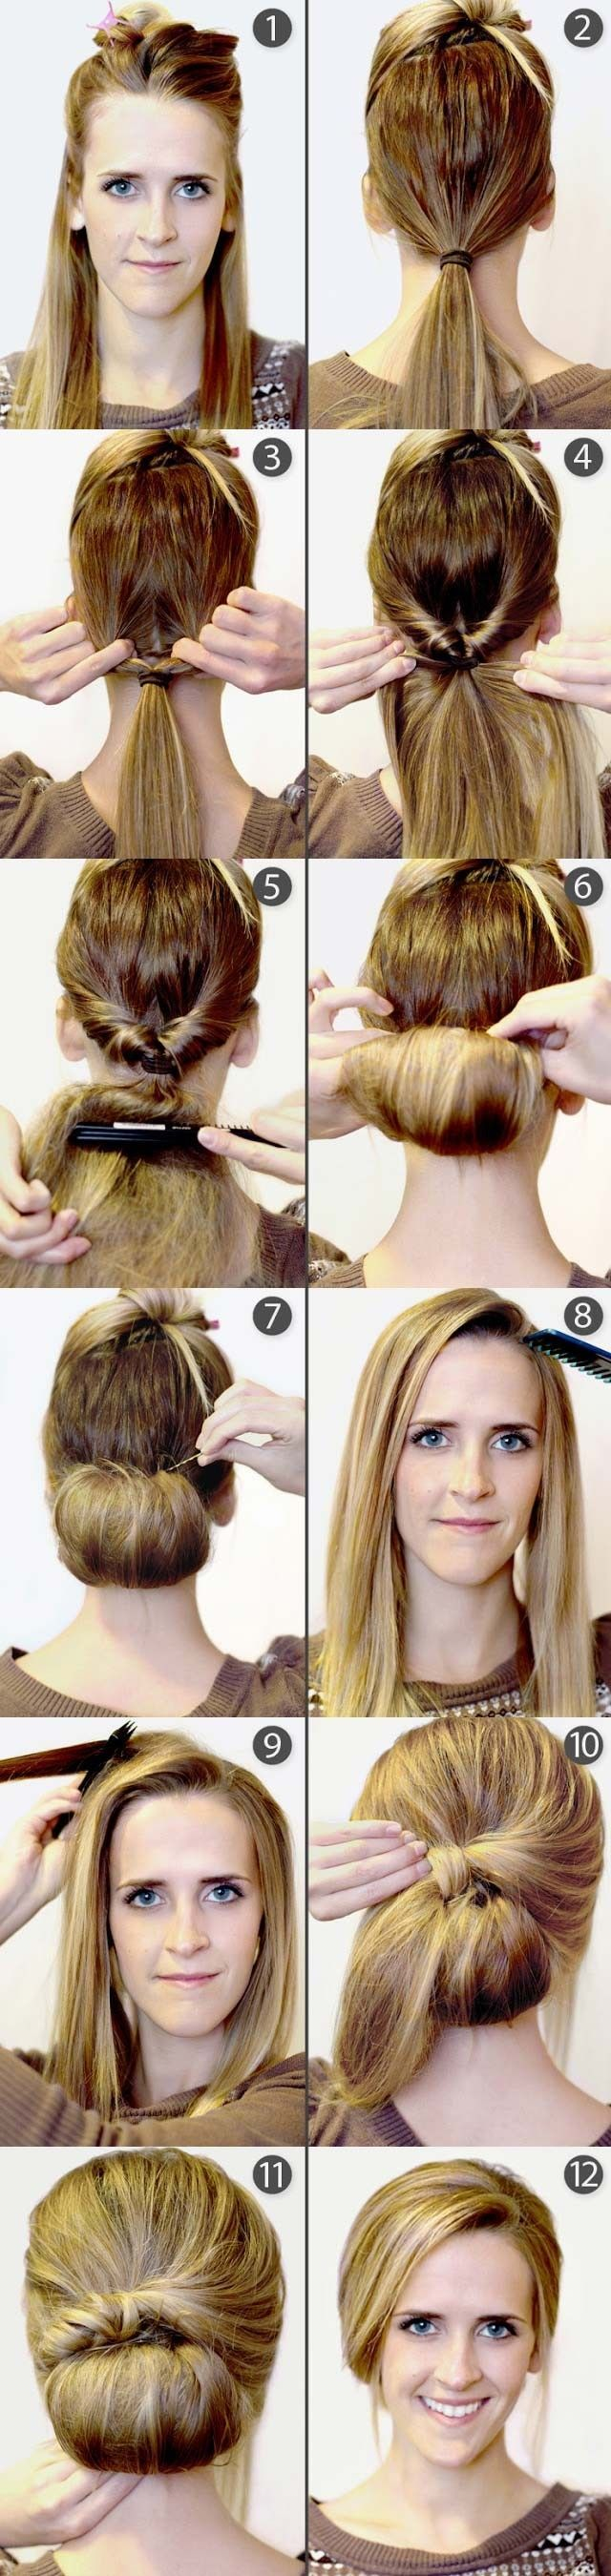 Hair Styles Ideas Vintage Updo Hairstyle Tutorial Listfender